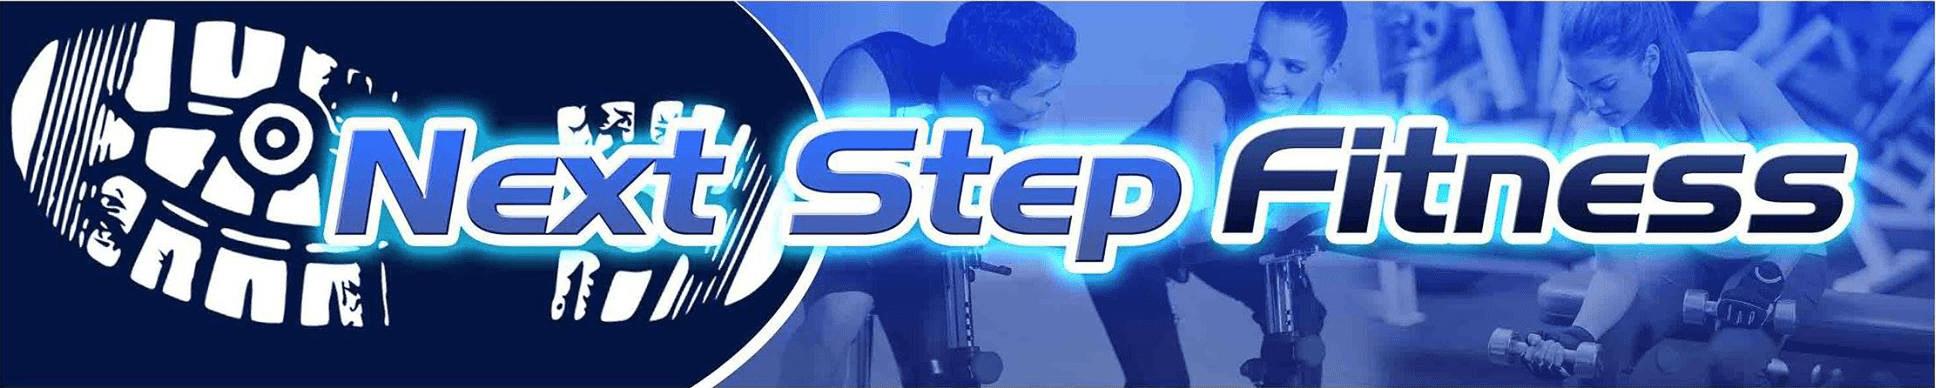 Next Step Fitness Banner Ocala's 24 Hour Gym